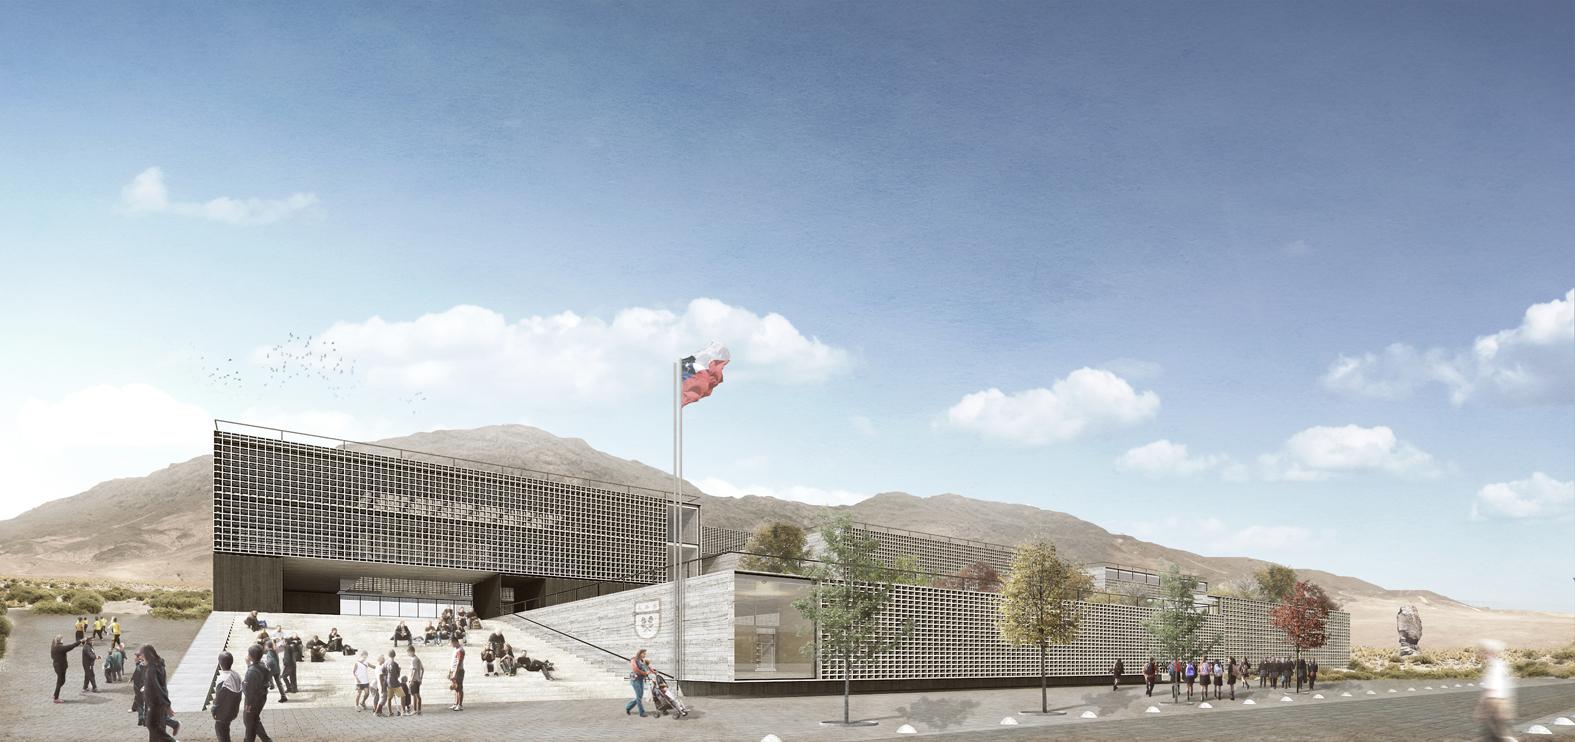 The Antofagasta British School